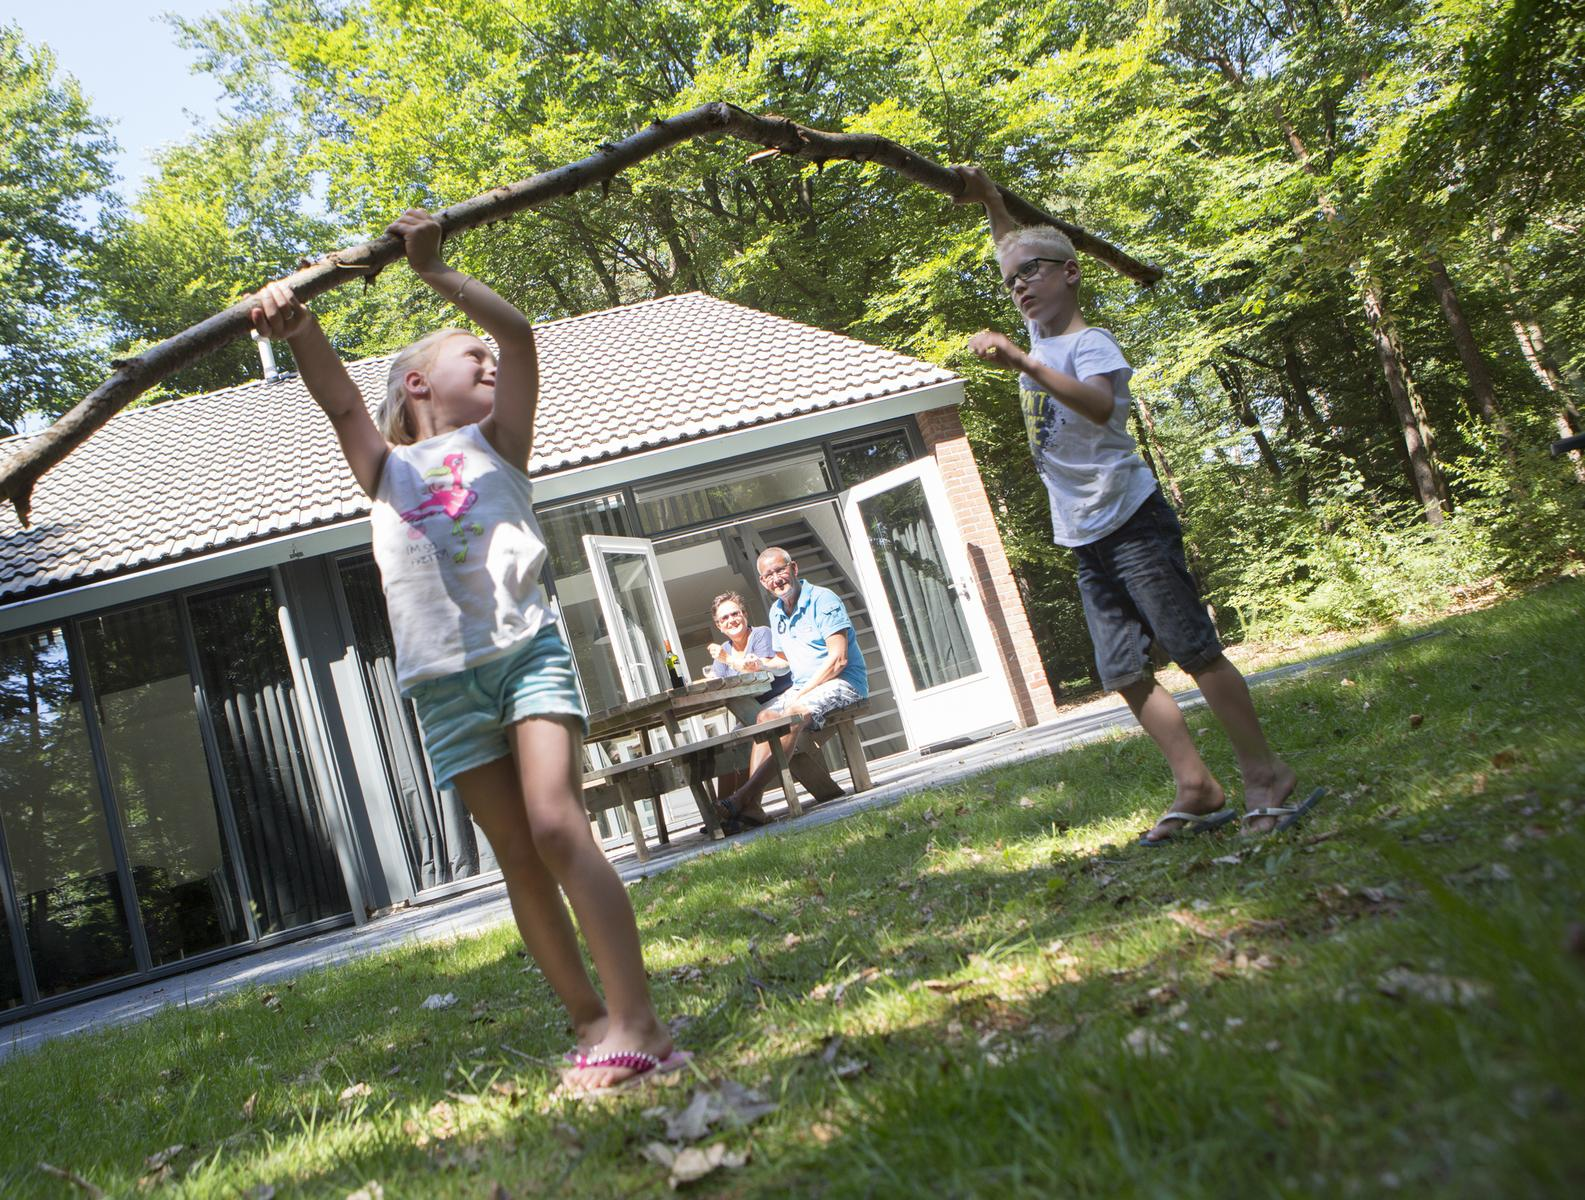 6 pers. Kinderbungalow | Norgerberg